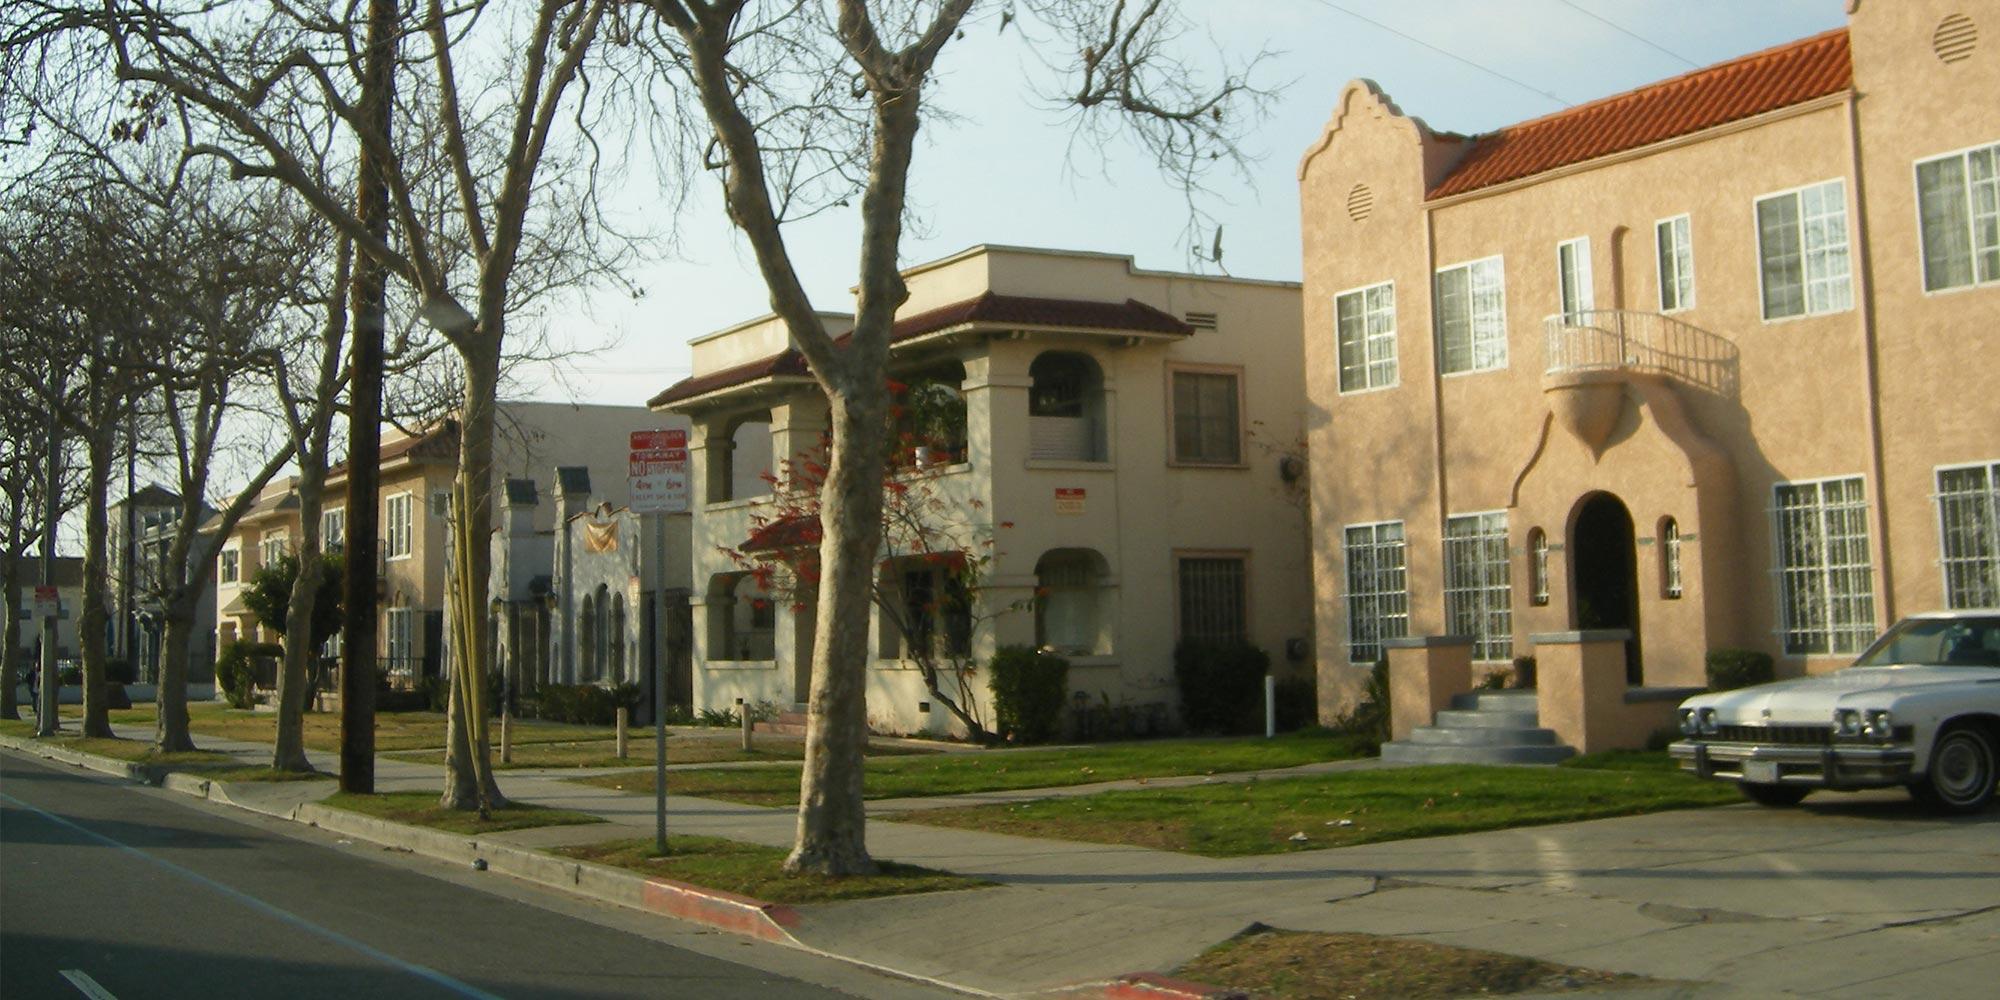 Leimert Park in South Los Angeles.